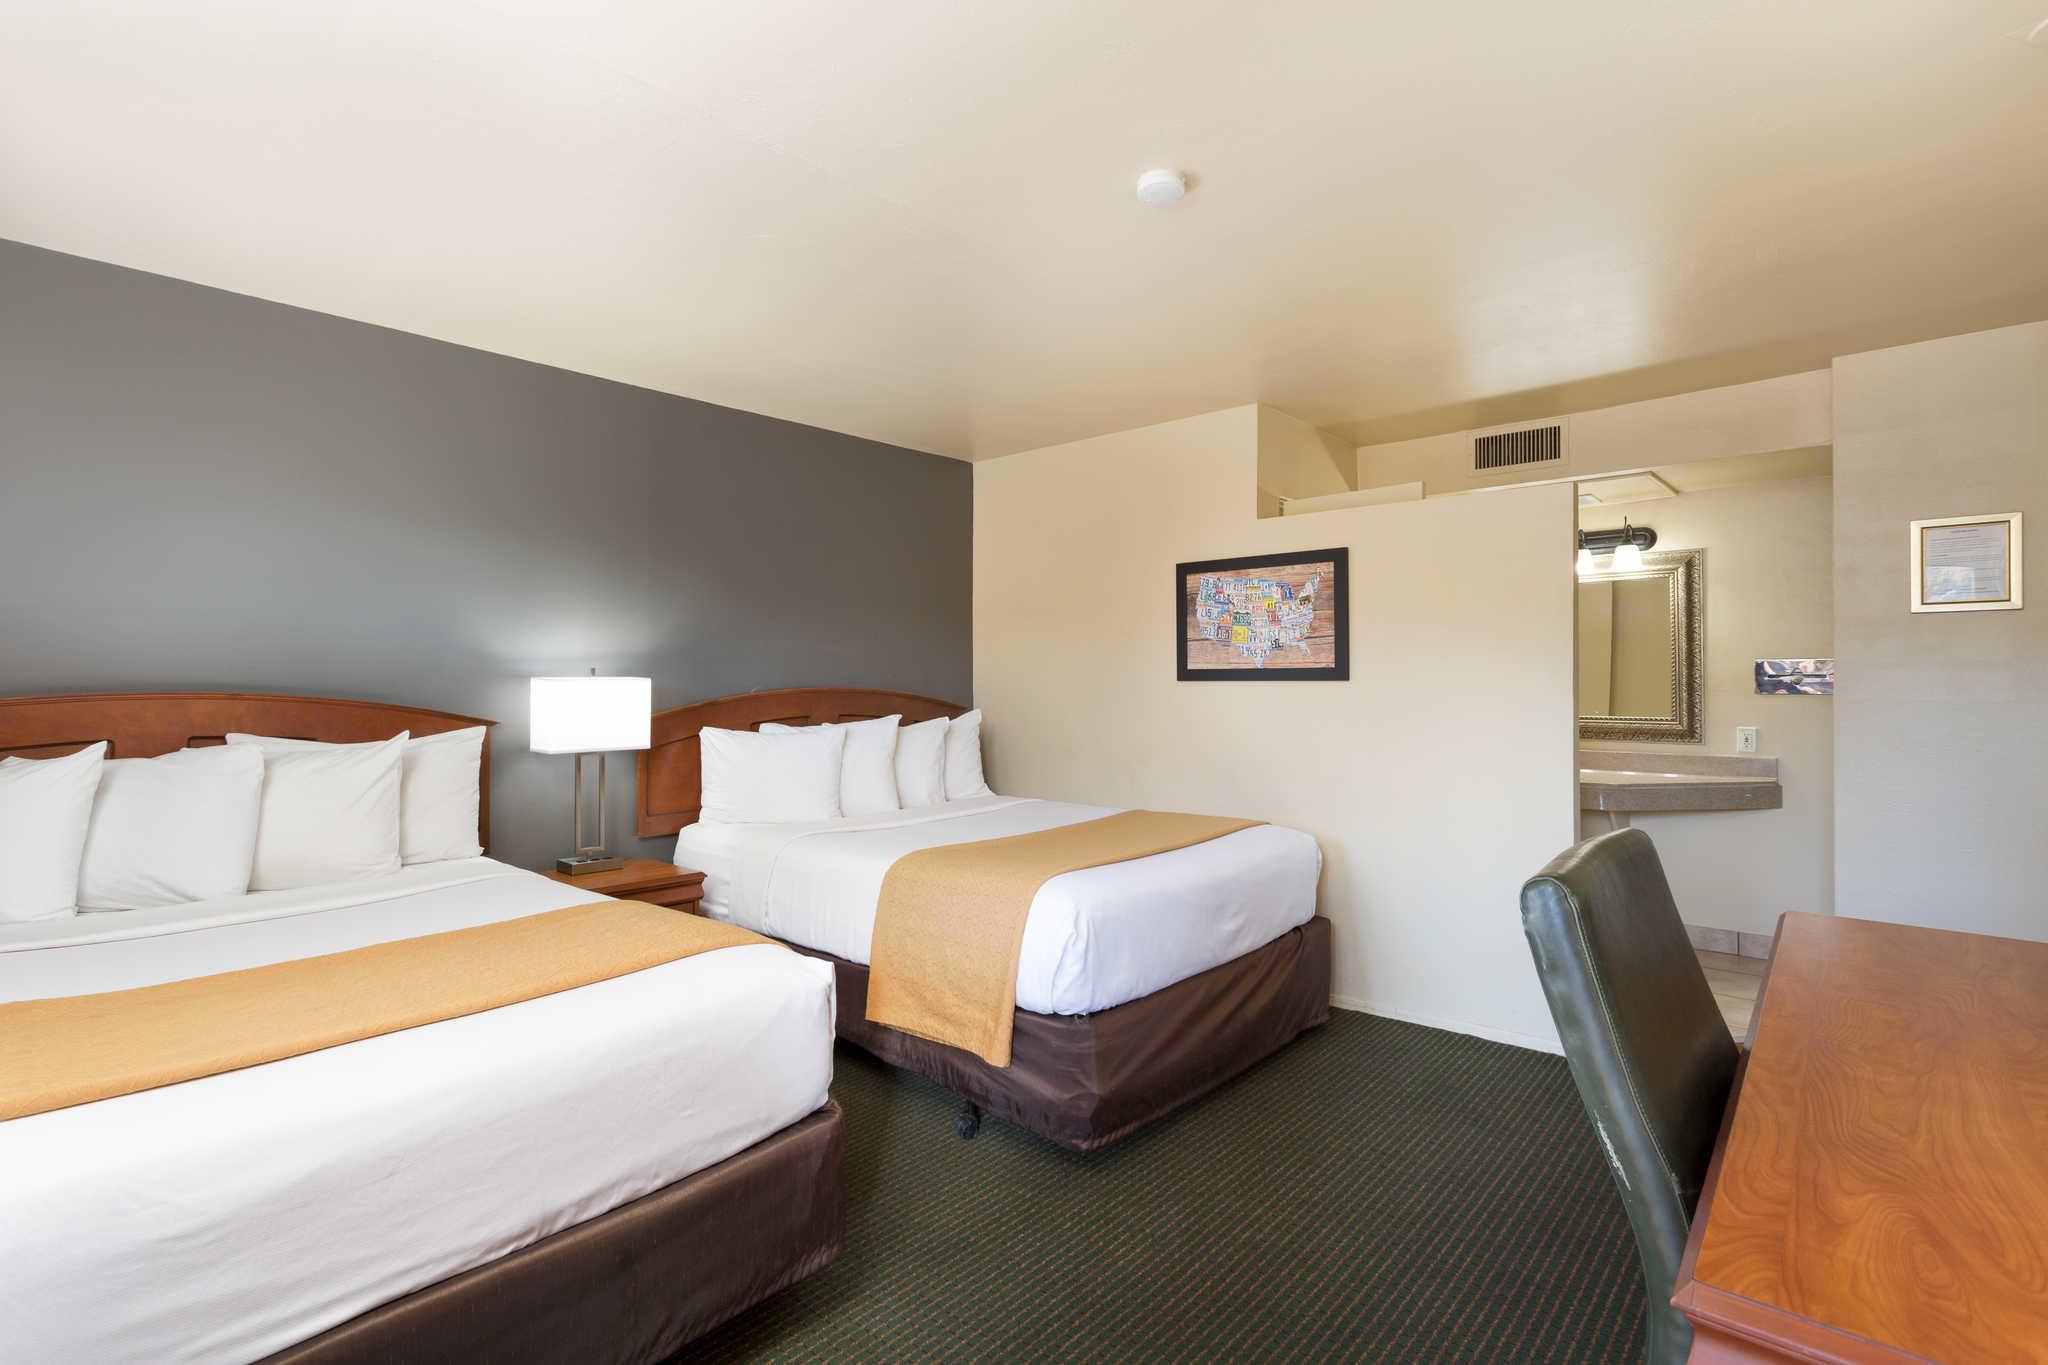 Econo Lodge  Inn & Suites image 18